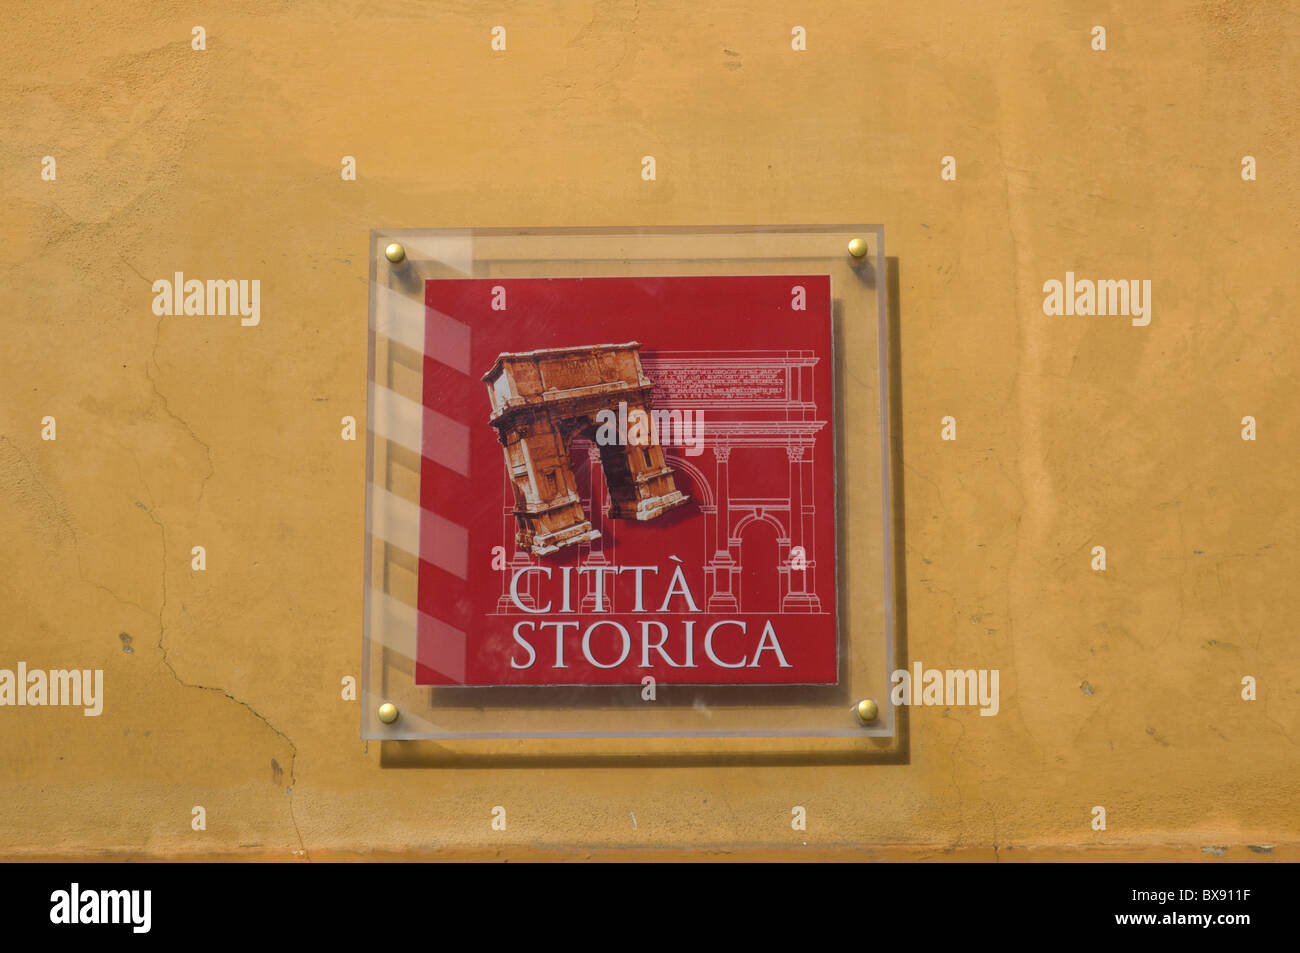 Citta storico the historical city sign Villa Borghese park Rome Italy Europe - Stock Image